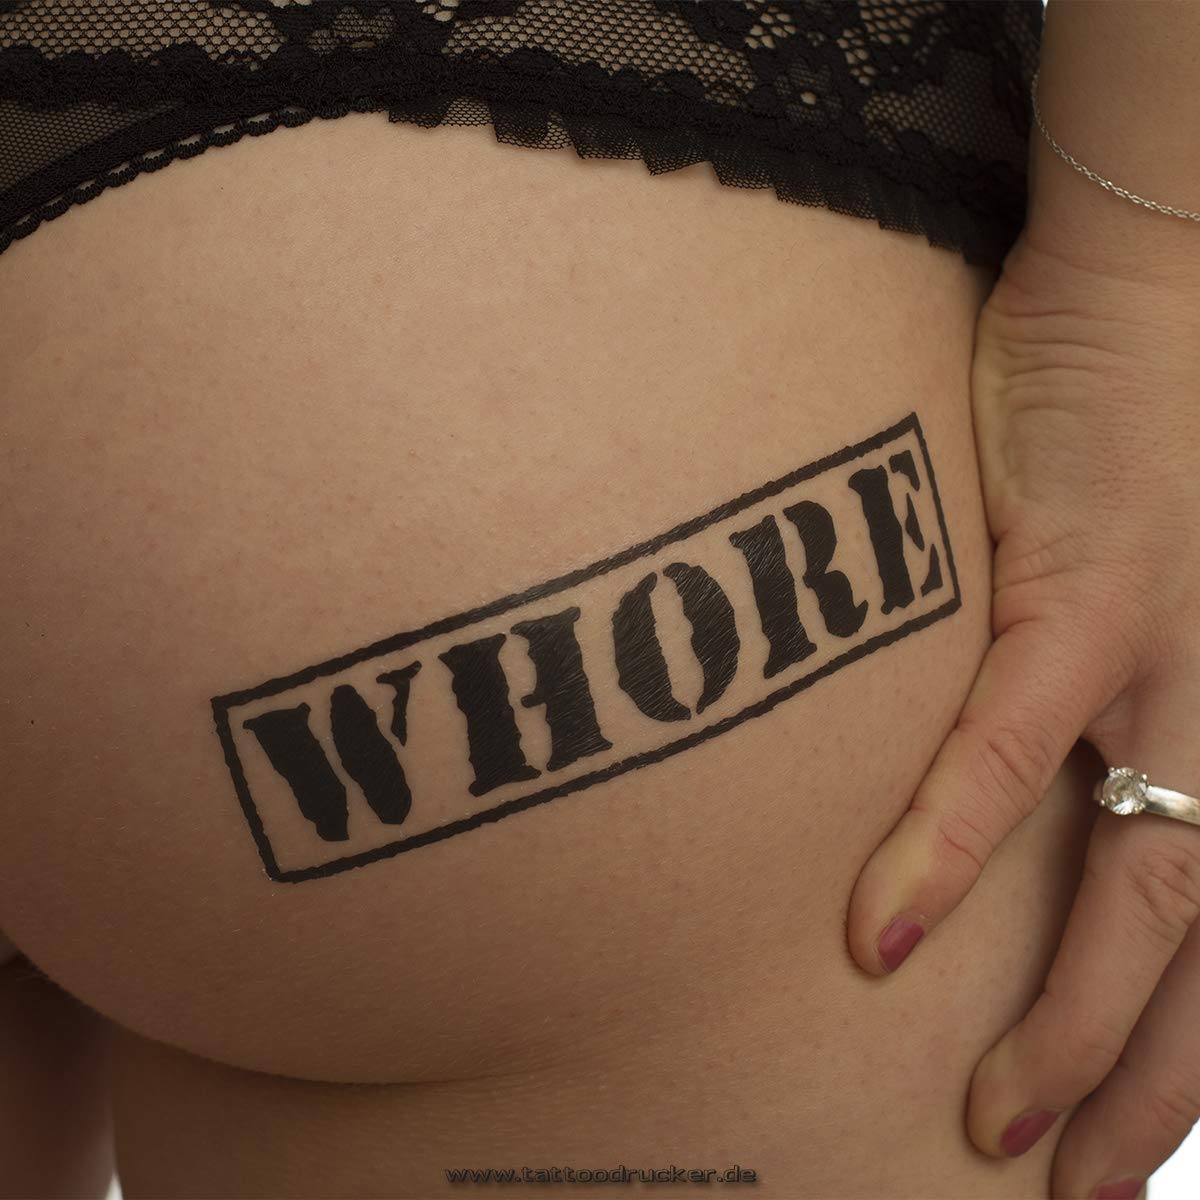 Sello Whore Tattoo Texto en Negro – Sexy Kinky Tattoo, Negro, 1 x ...